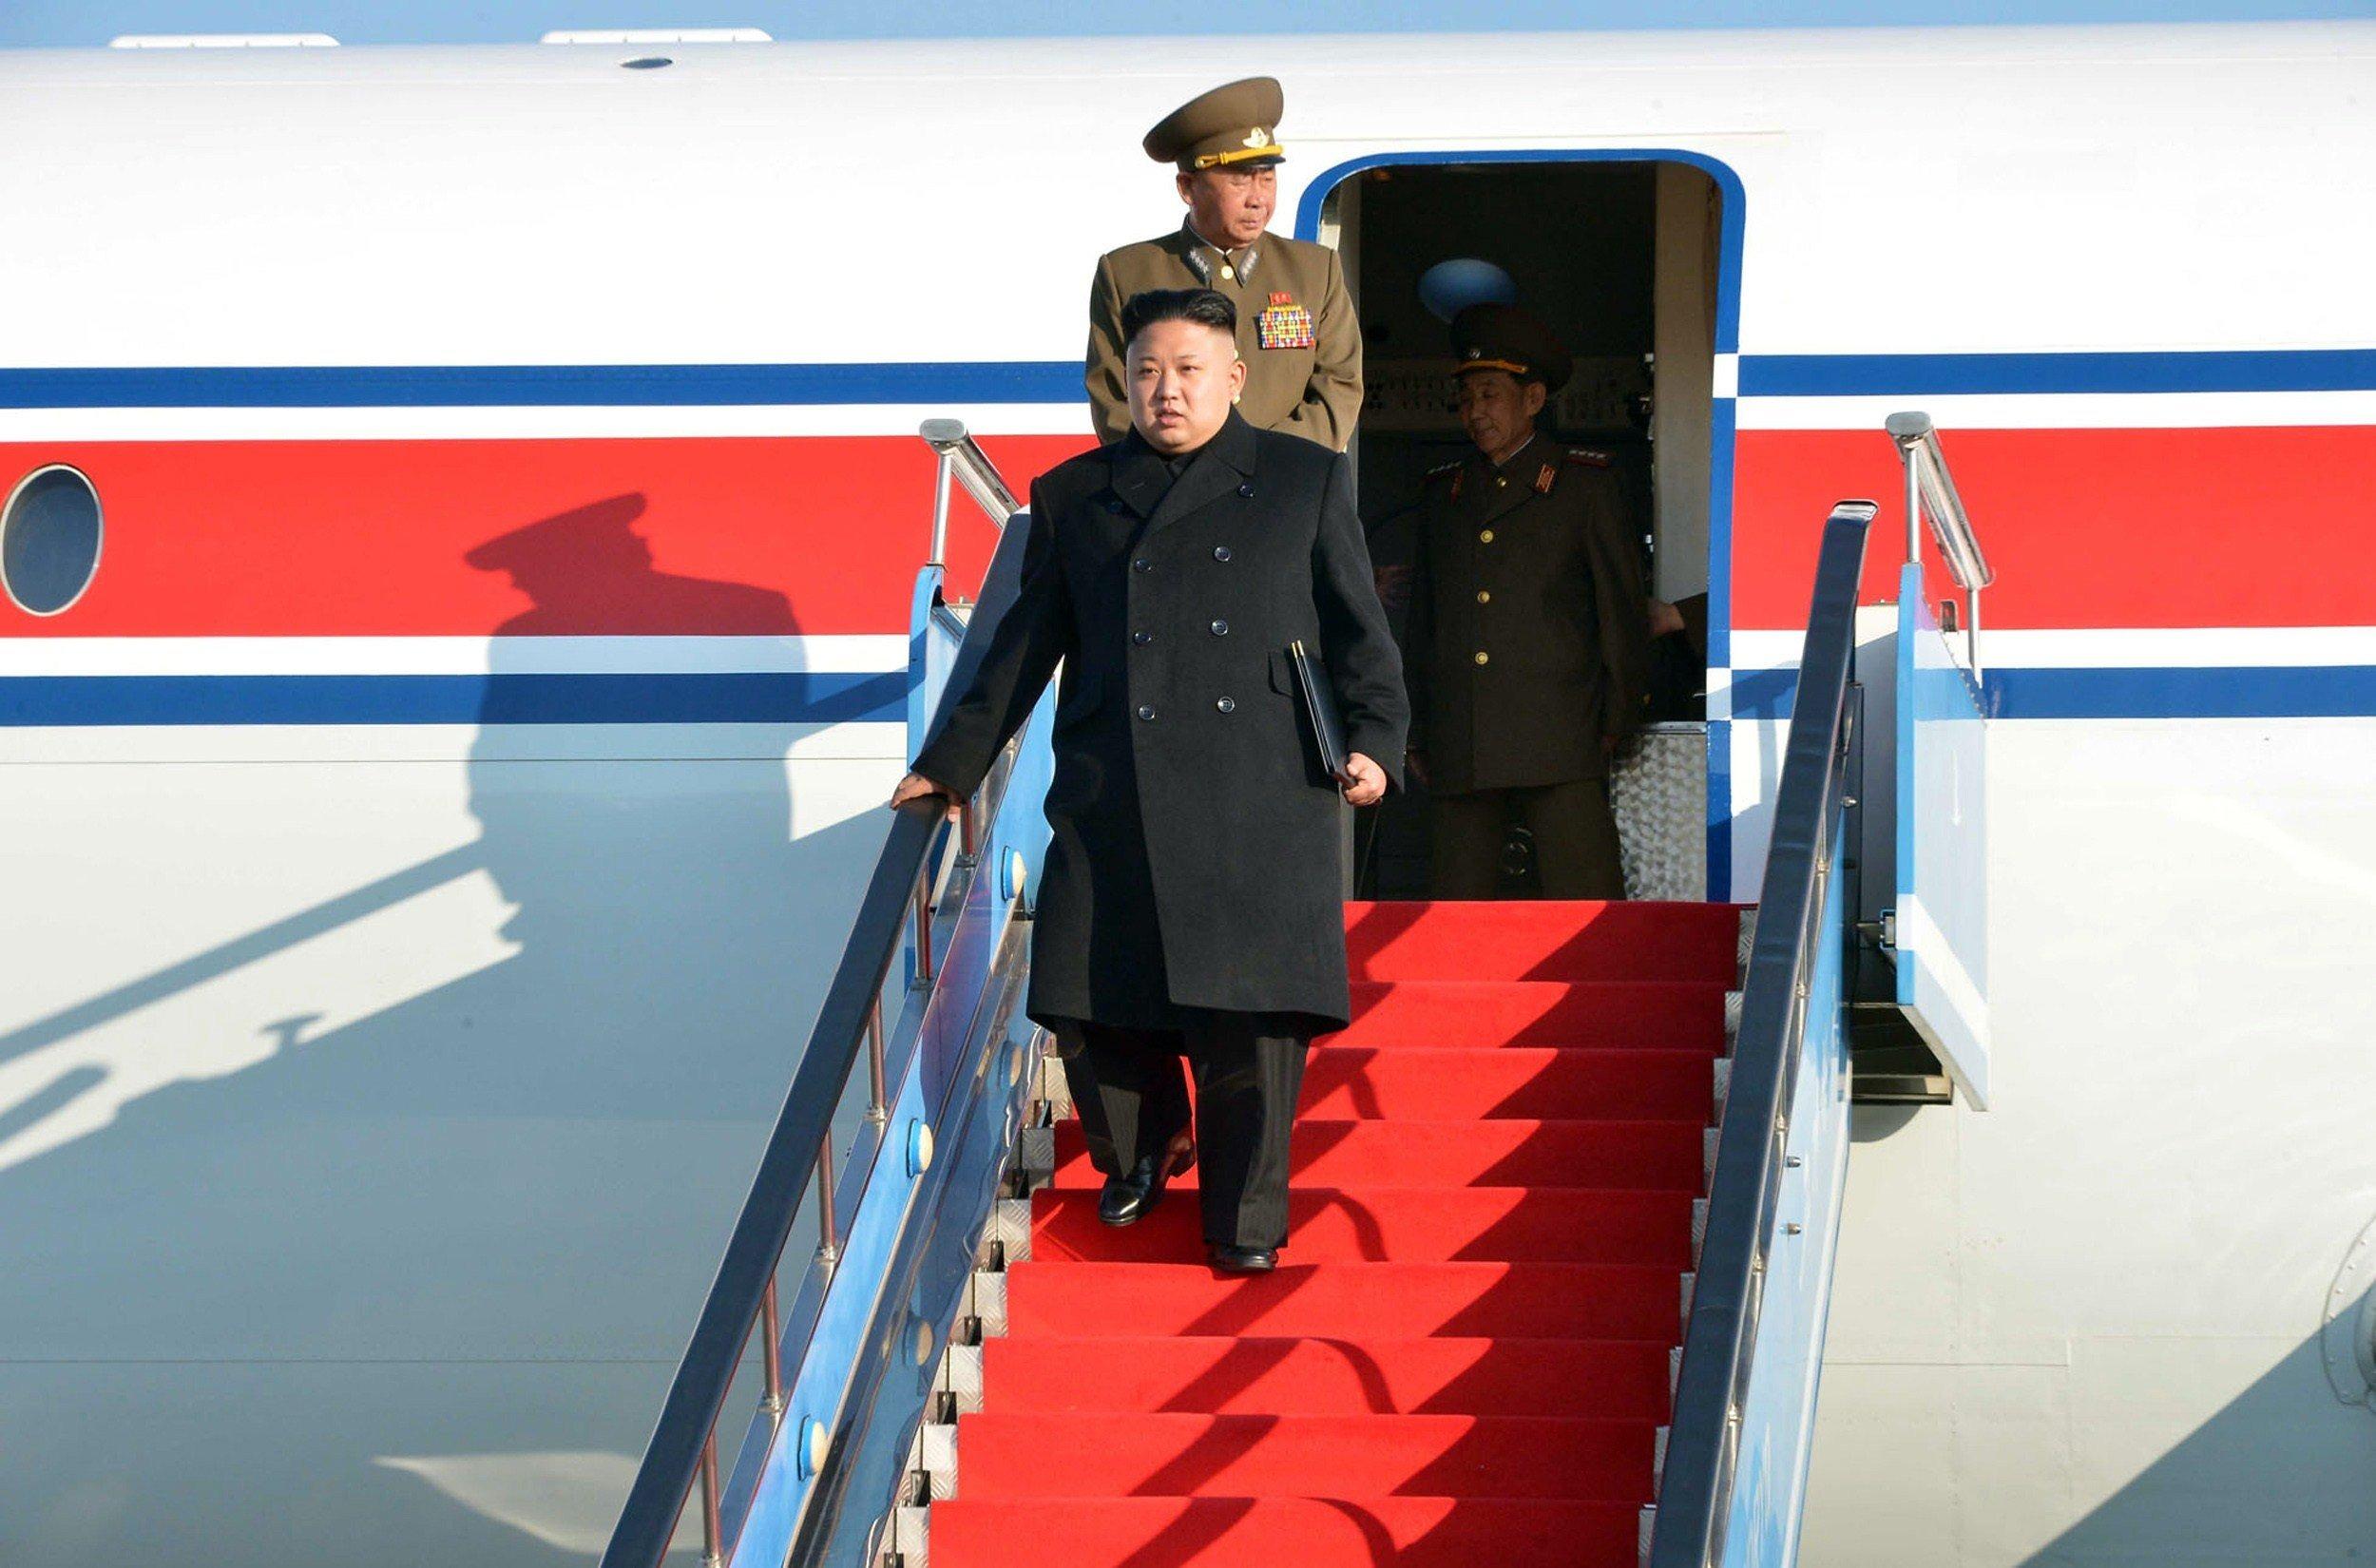 North Korean leader Kim Jong-Un arriving at the Samjiyong airport in Ryaggang province in North Korea, April 1, 2014.